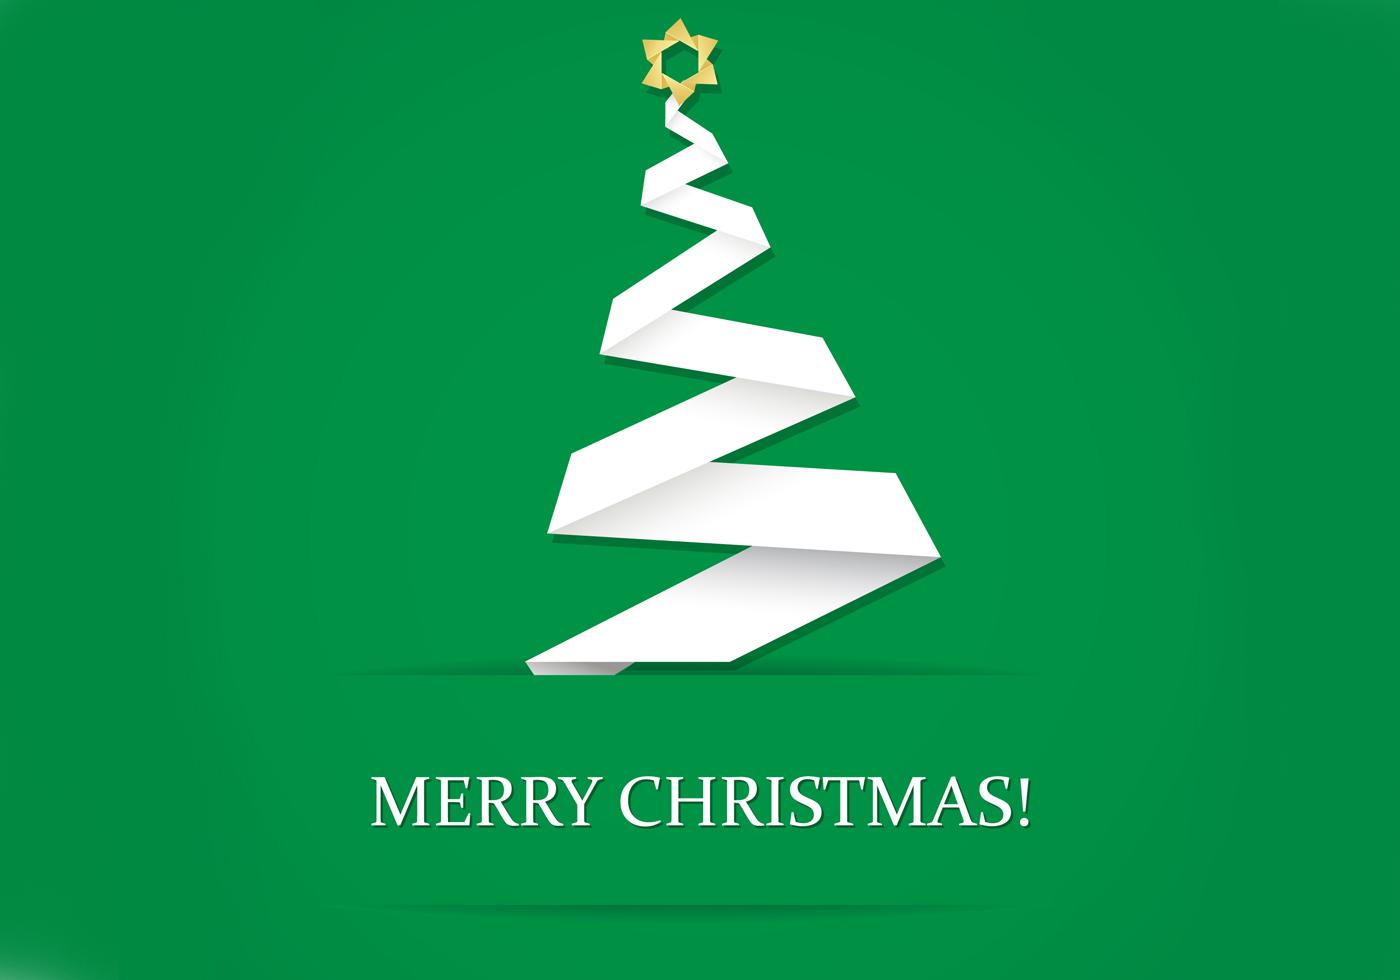 Santa Claus Wallpaper Hd Origami Christmas Tree Wallpaper And Brush Pack Free